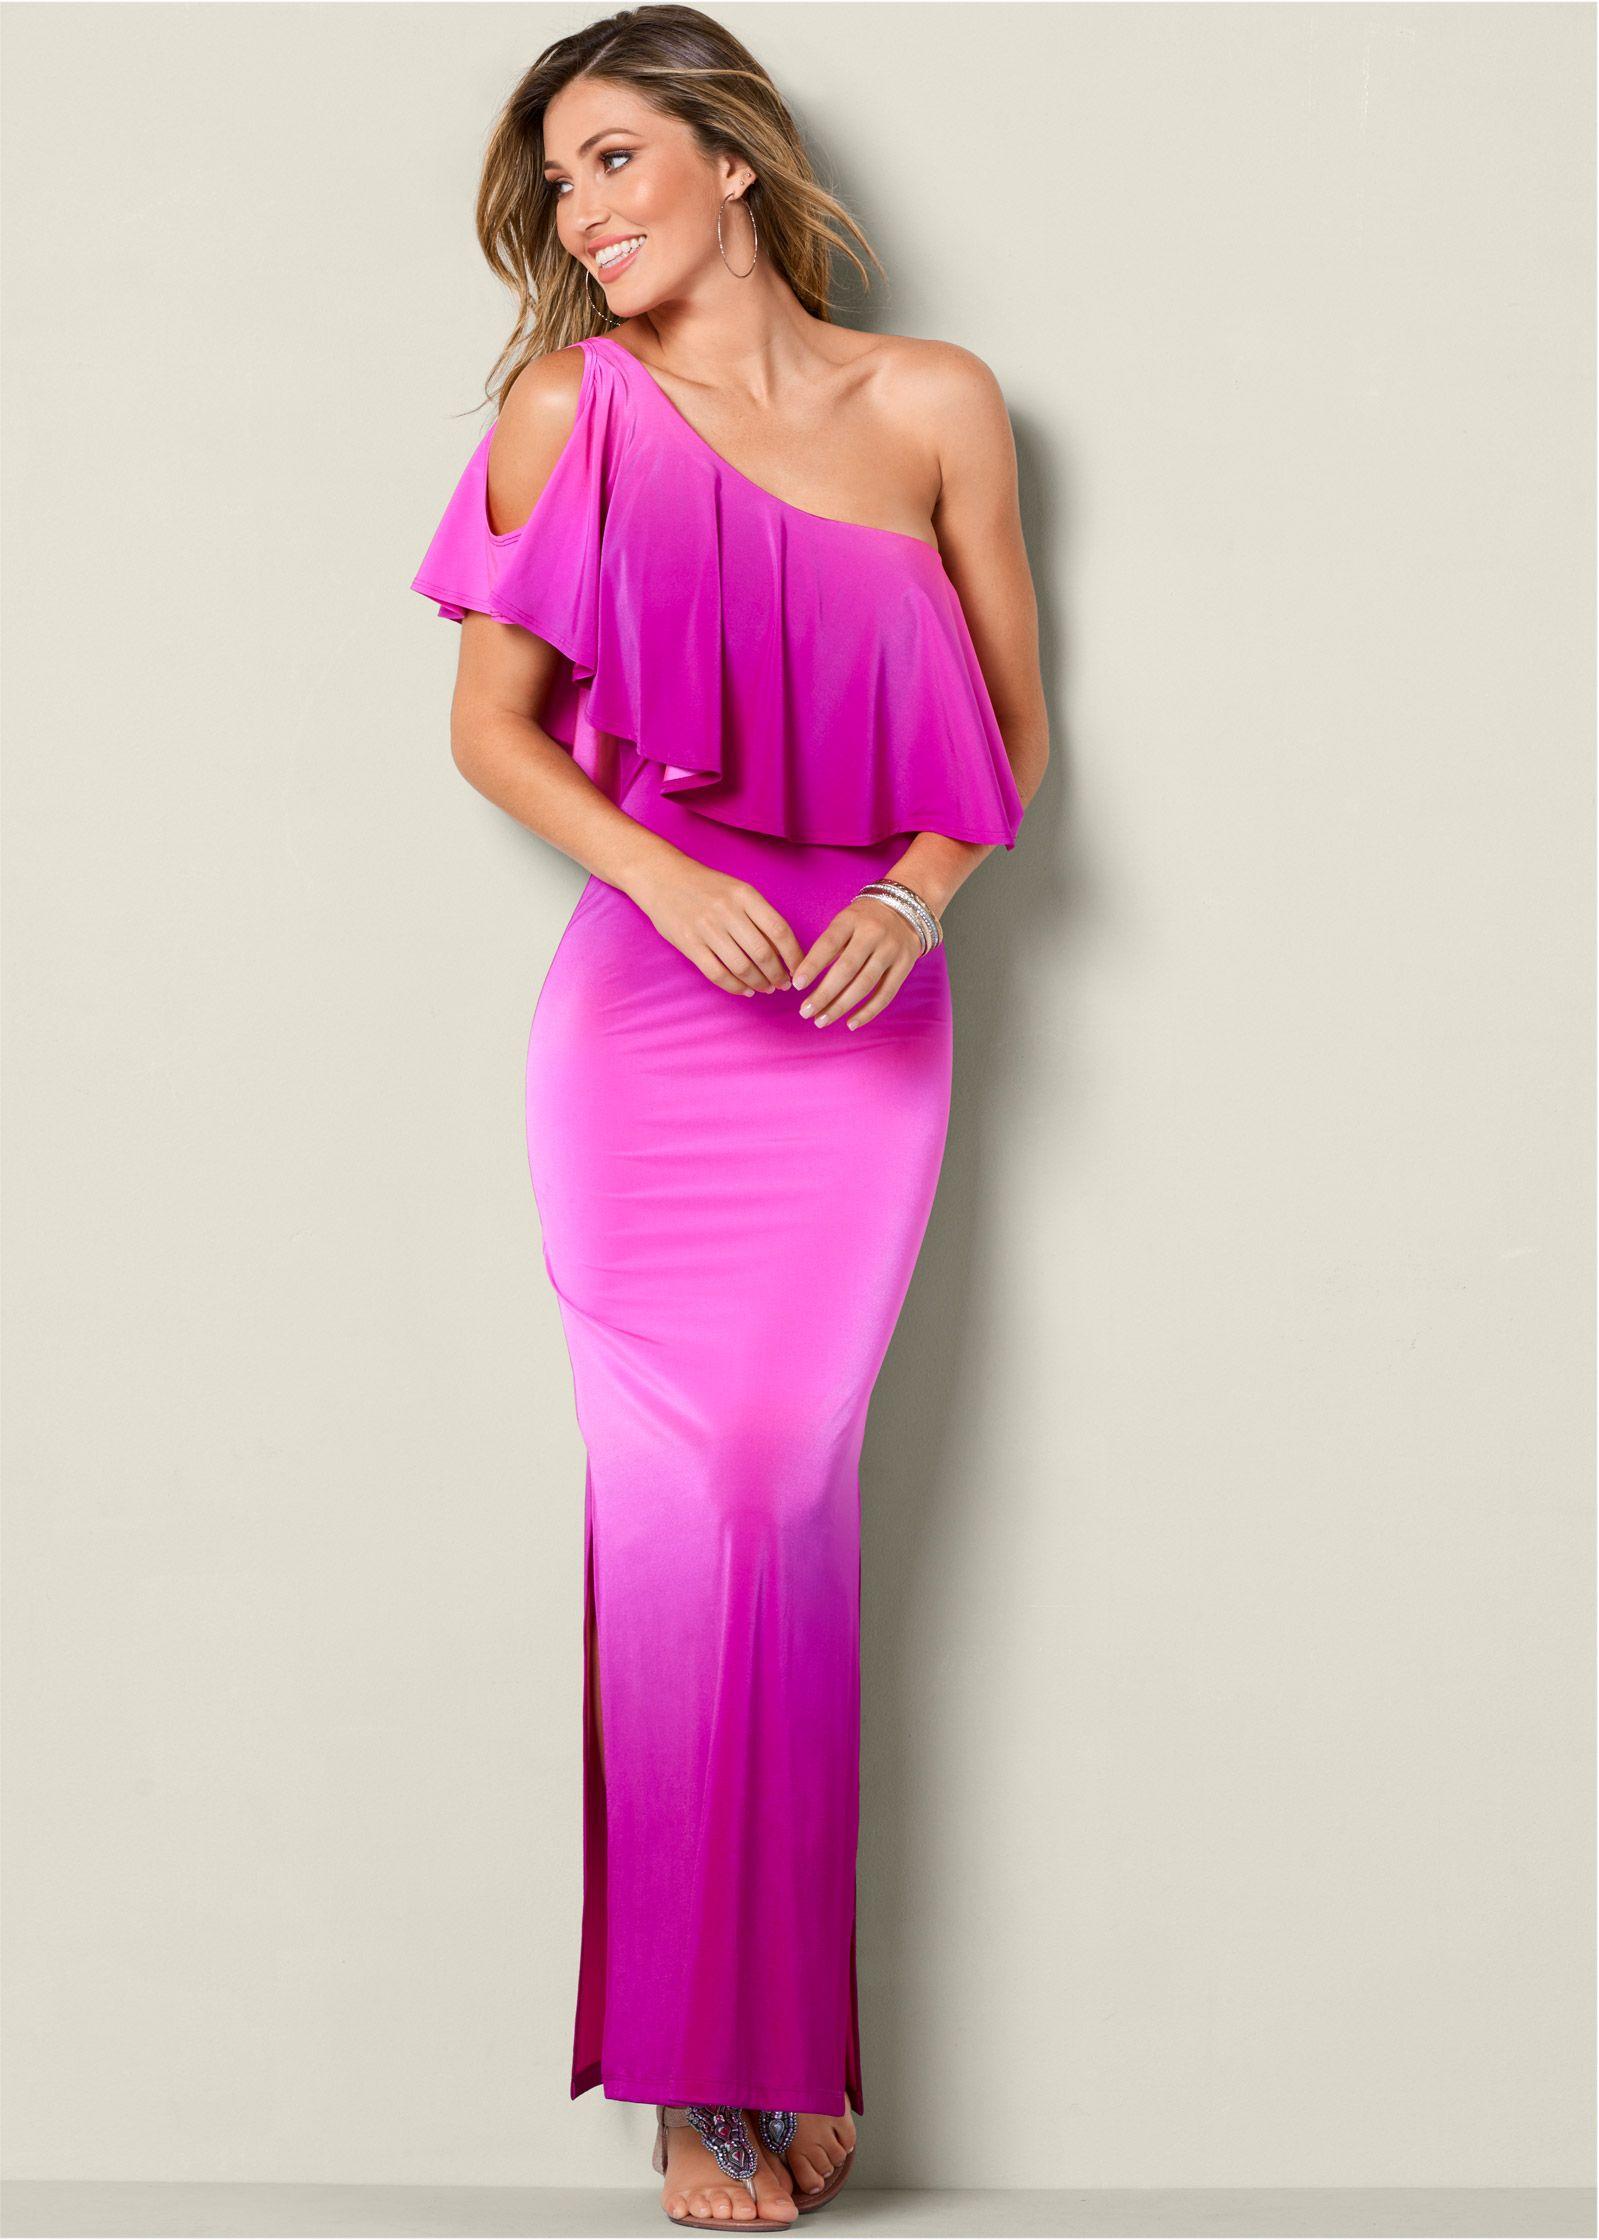 Life Is A Celebration Dress Like It Ombre Maxi Dress Thefashiontamer Com Ombre Maxi Dress Maxi Dress Long Maxi Dress [ 2240 x 1599 Pixel ]